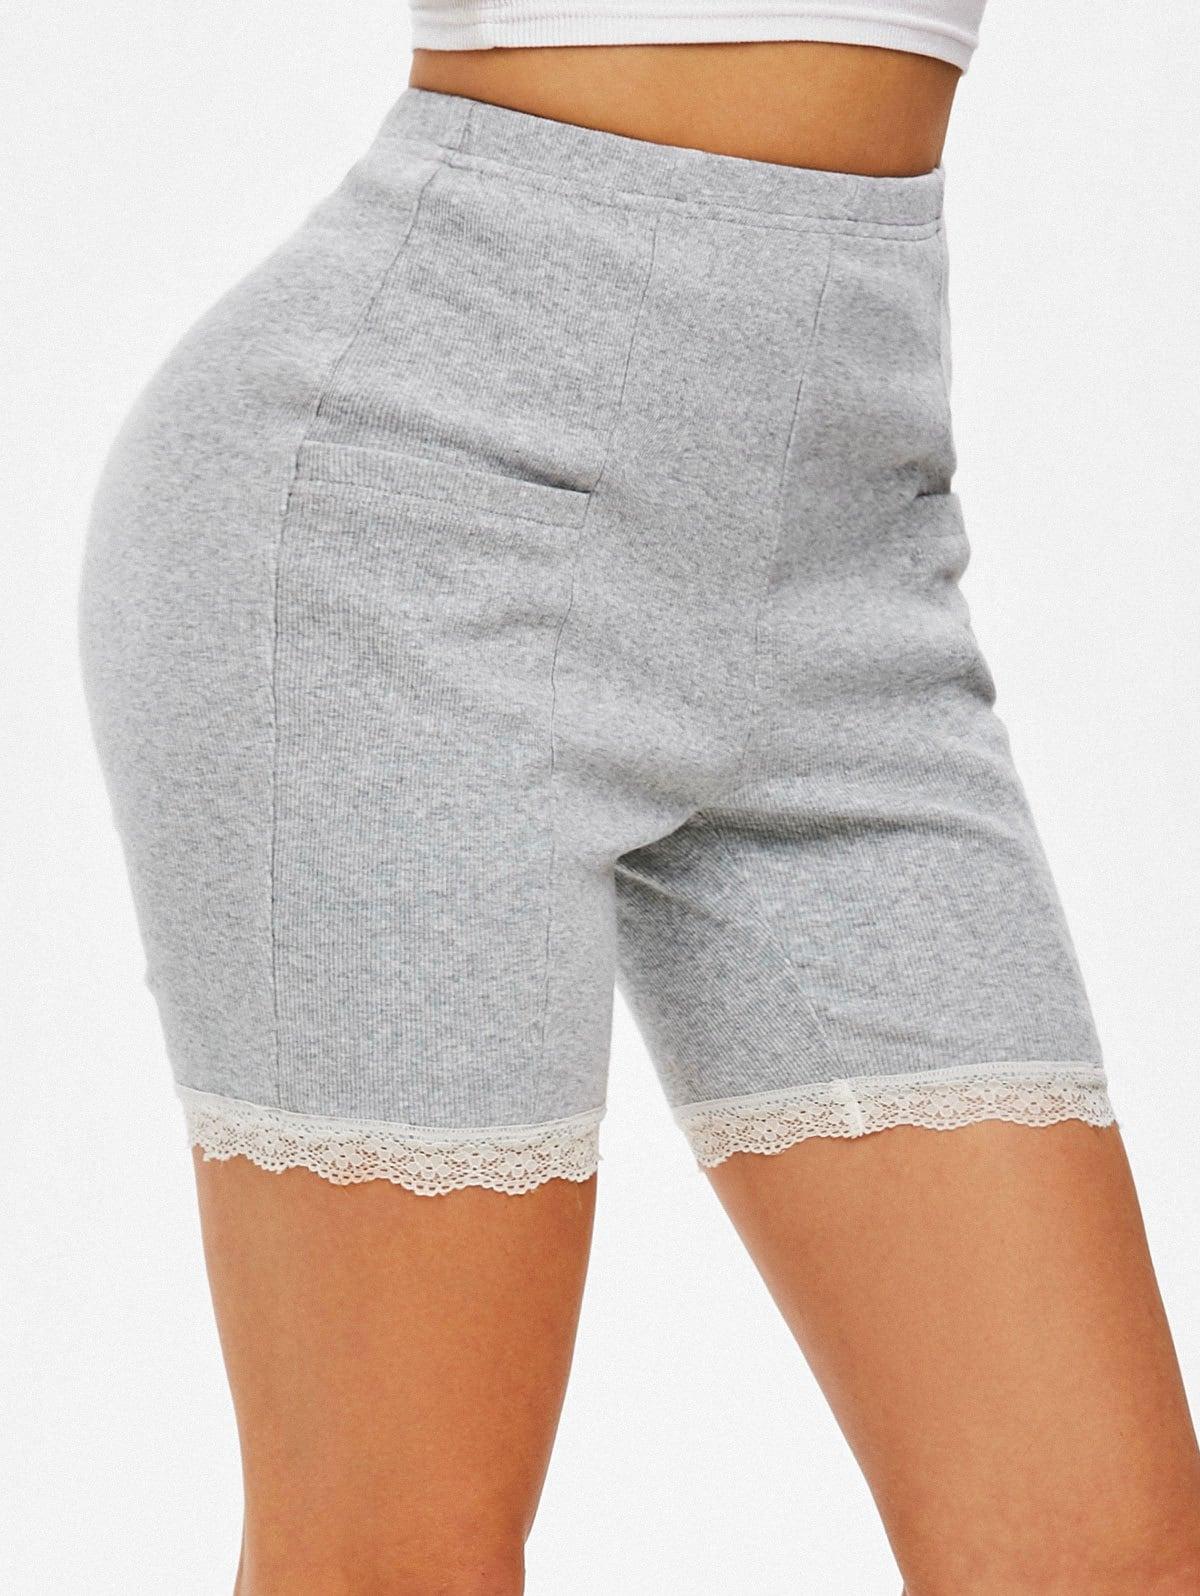 High Waisted Lace Trim Mini Shorts